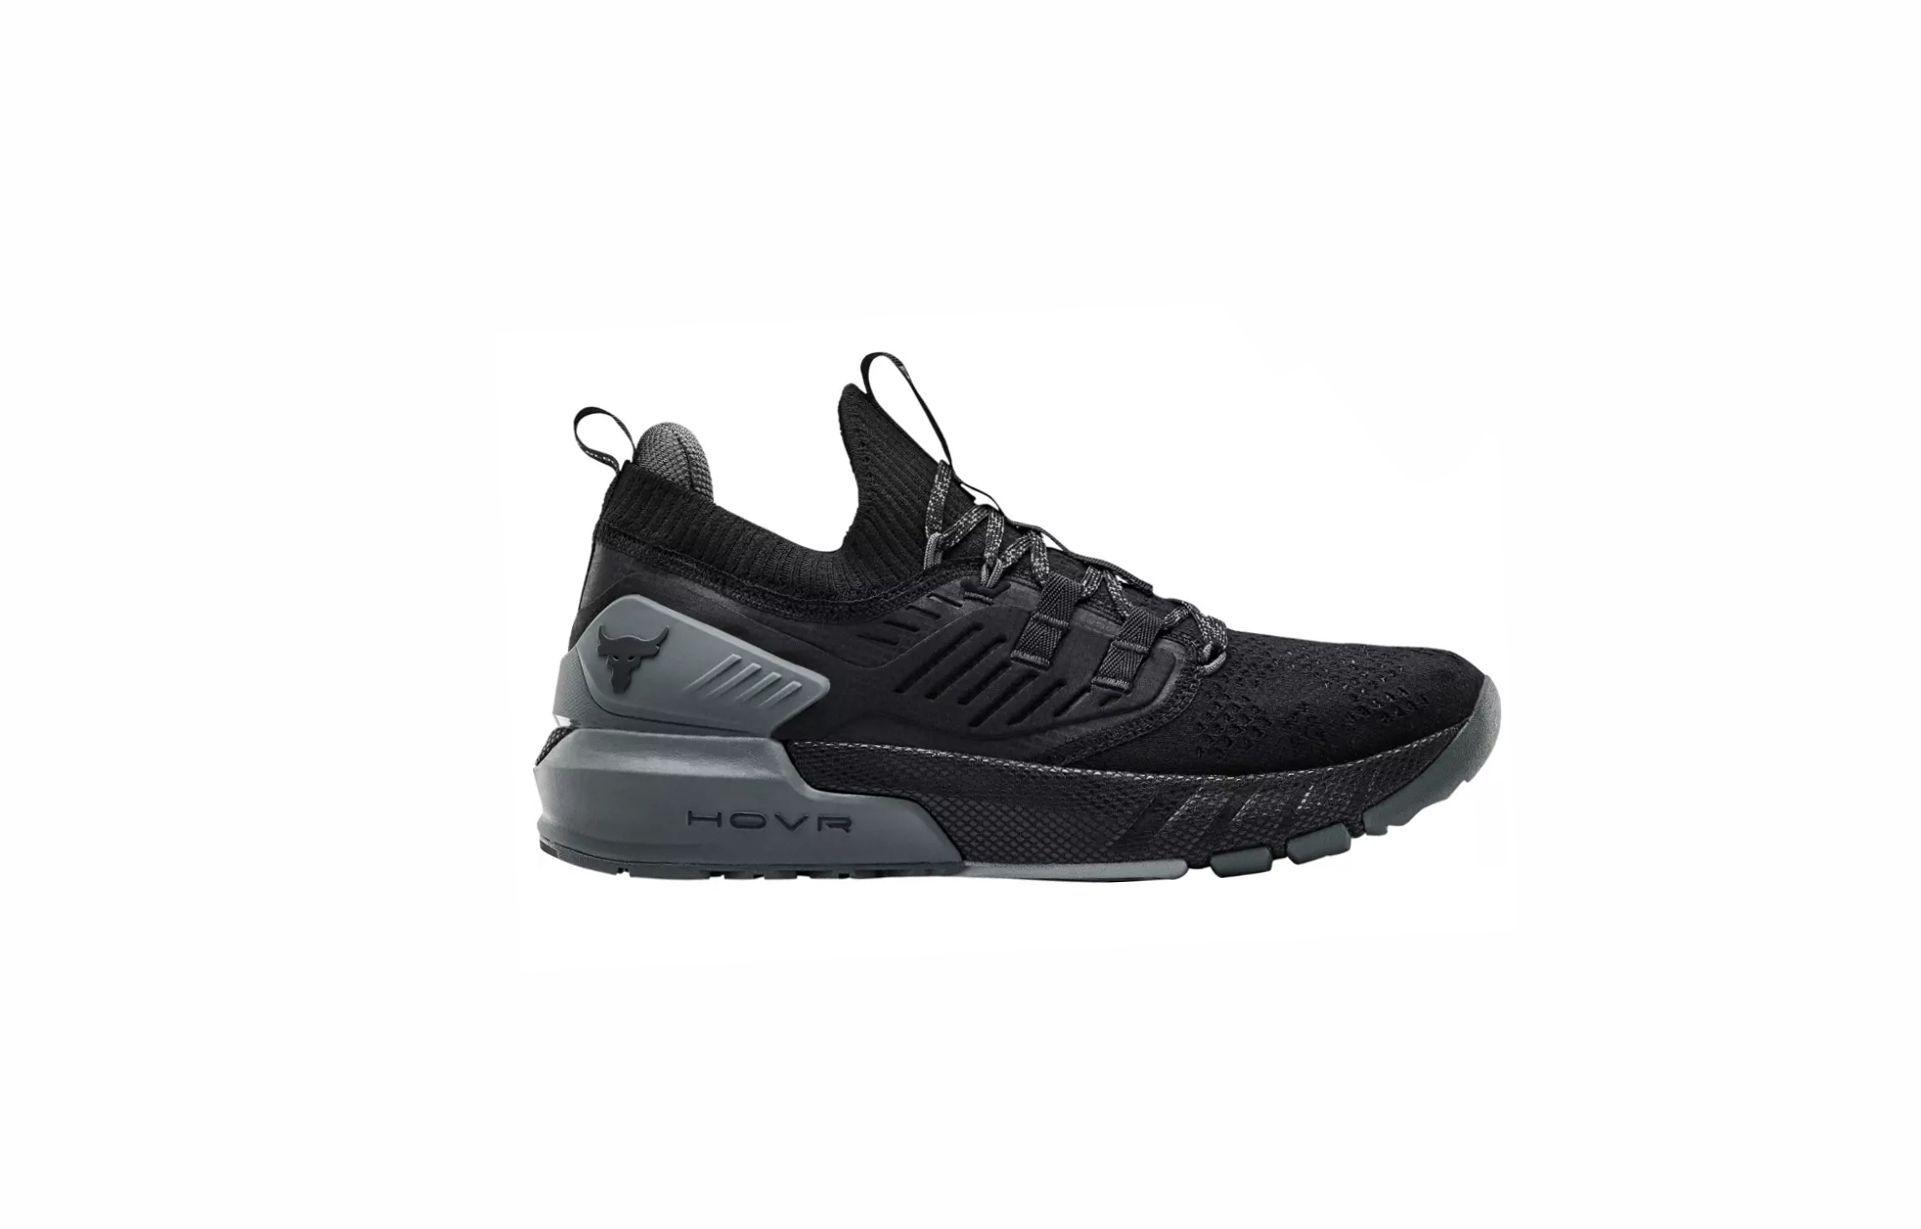 slip on cross training shoes